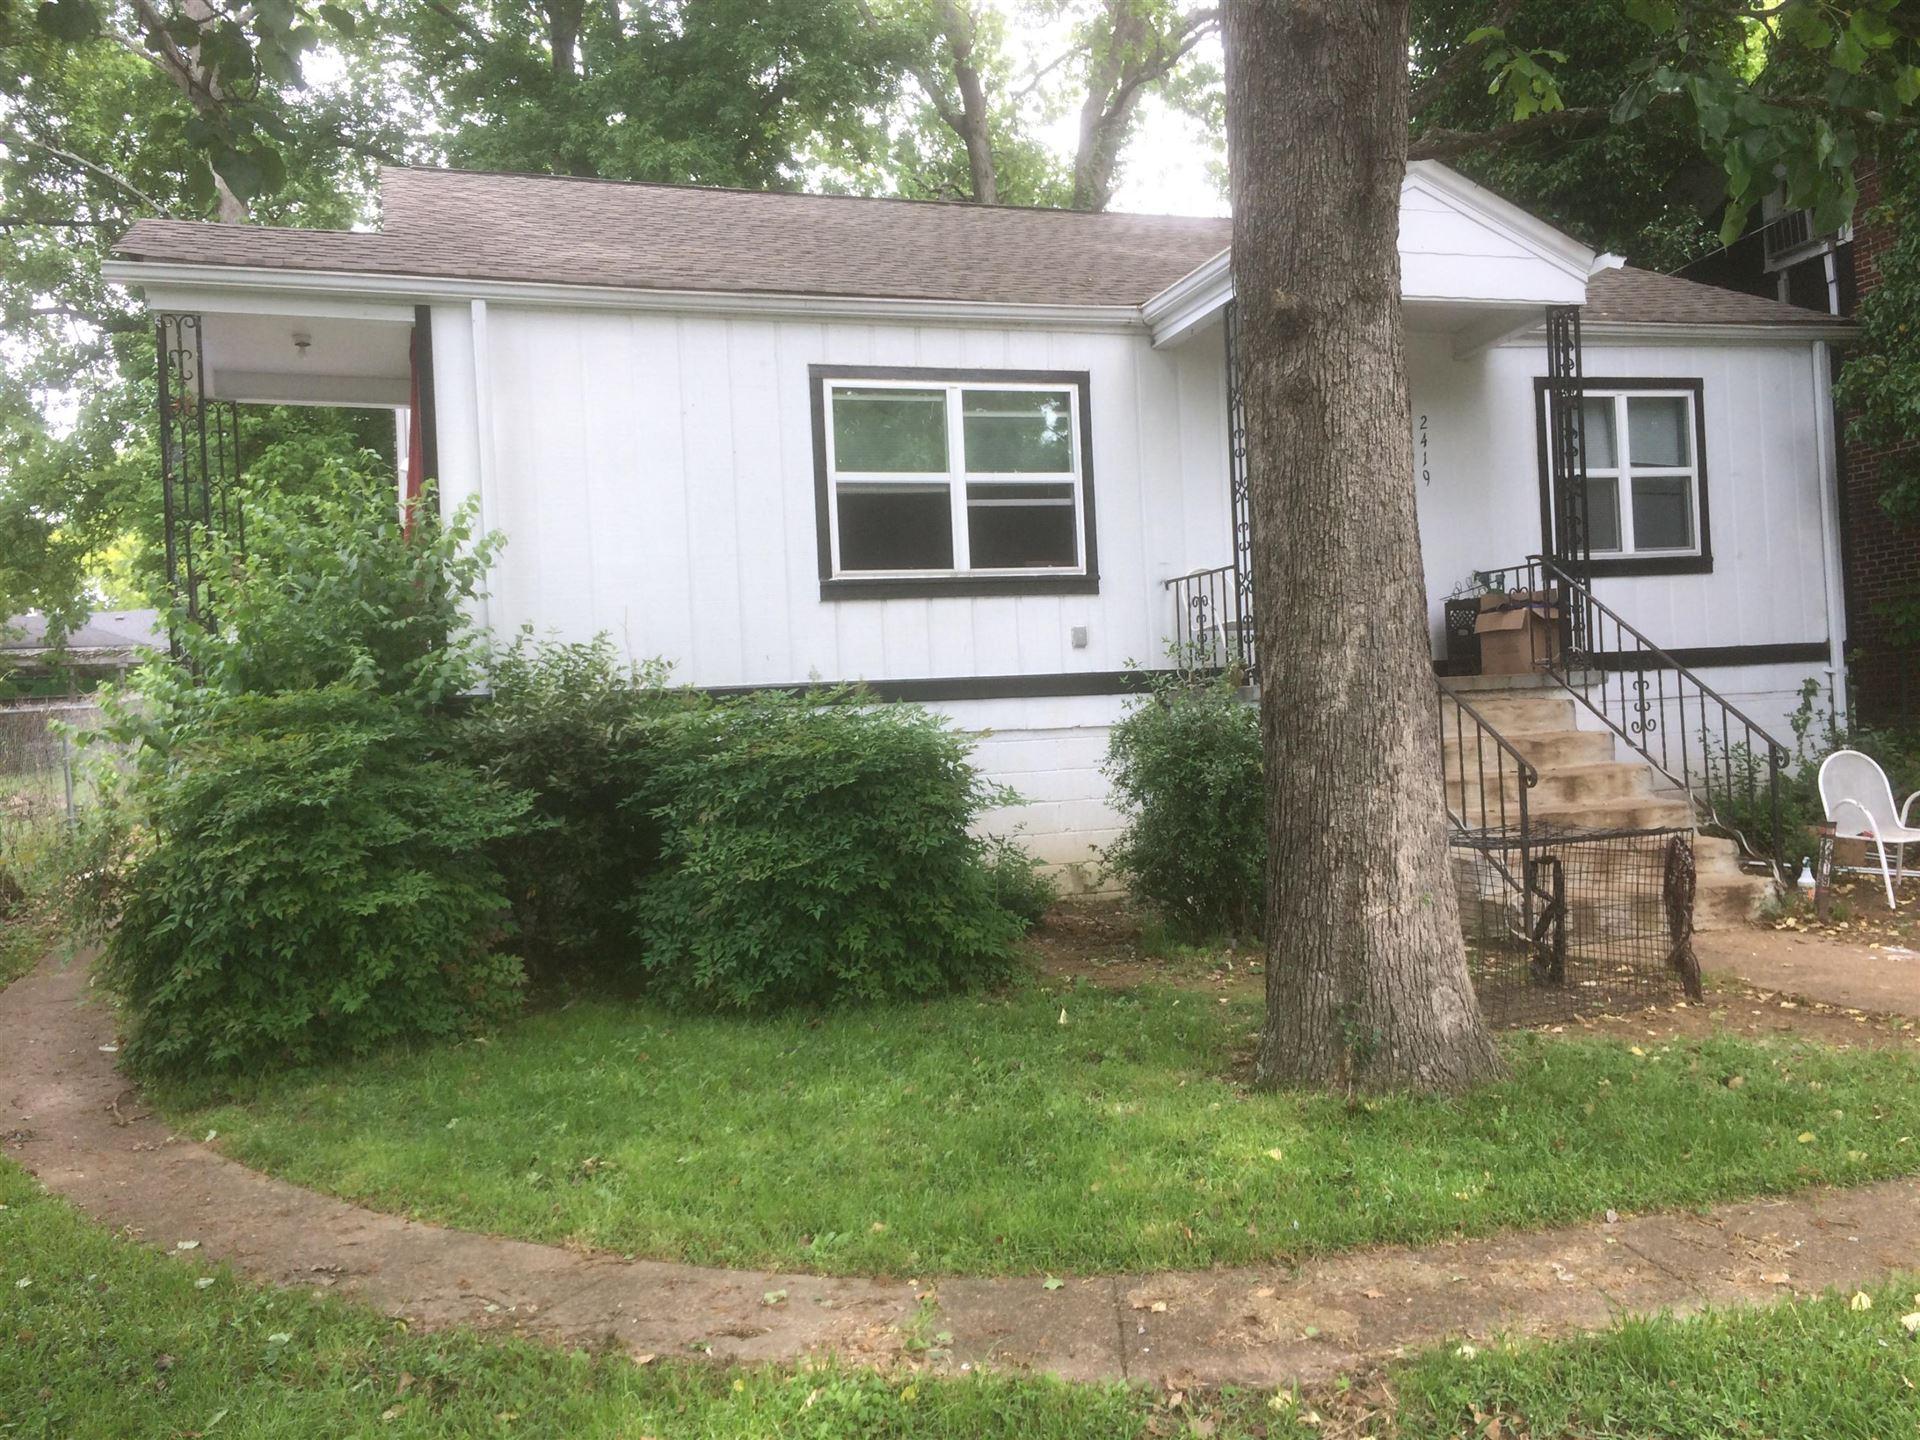 2419 Vine St, Chattanooga, TN 37404 - #: 1321228